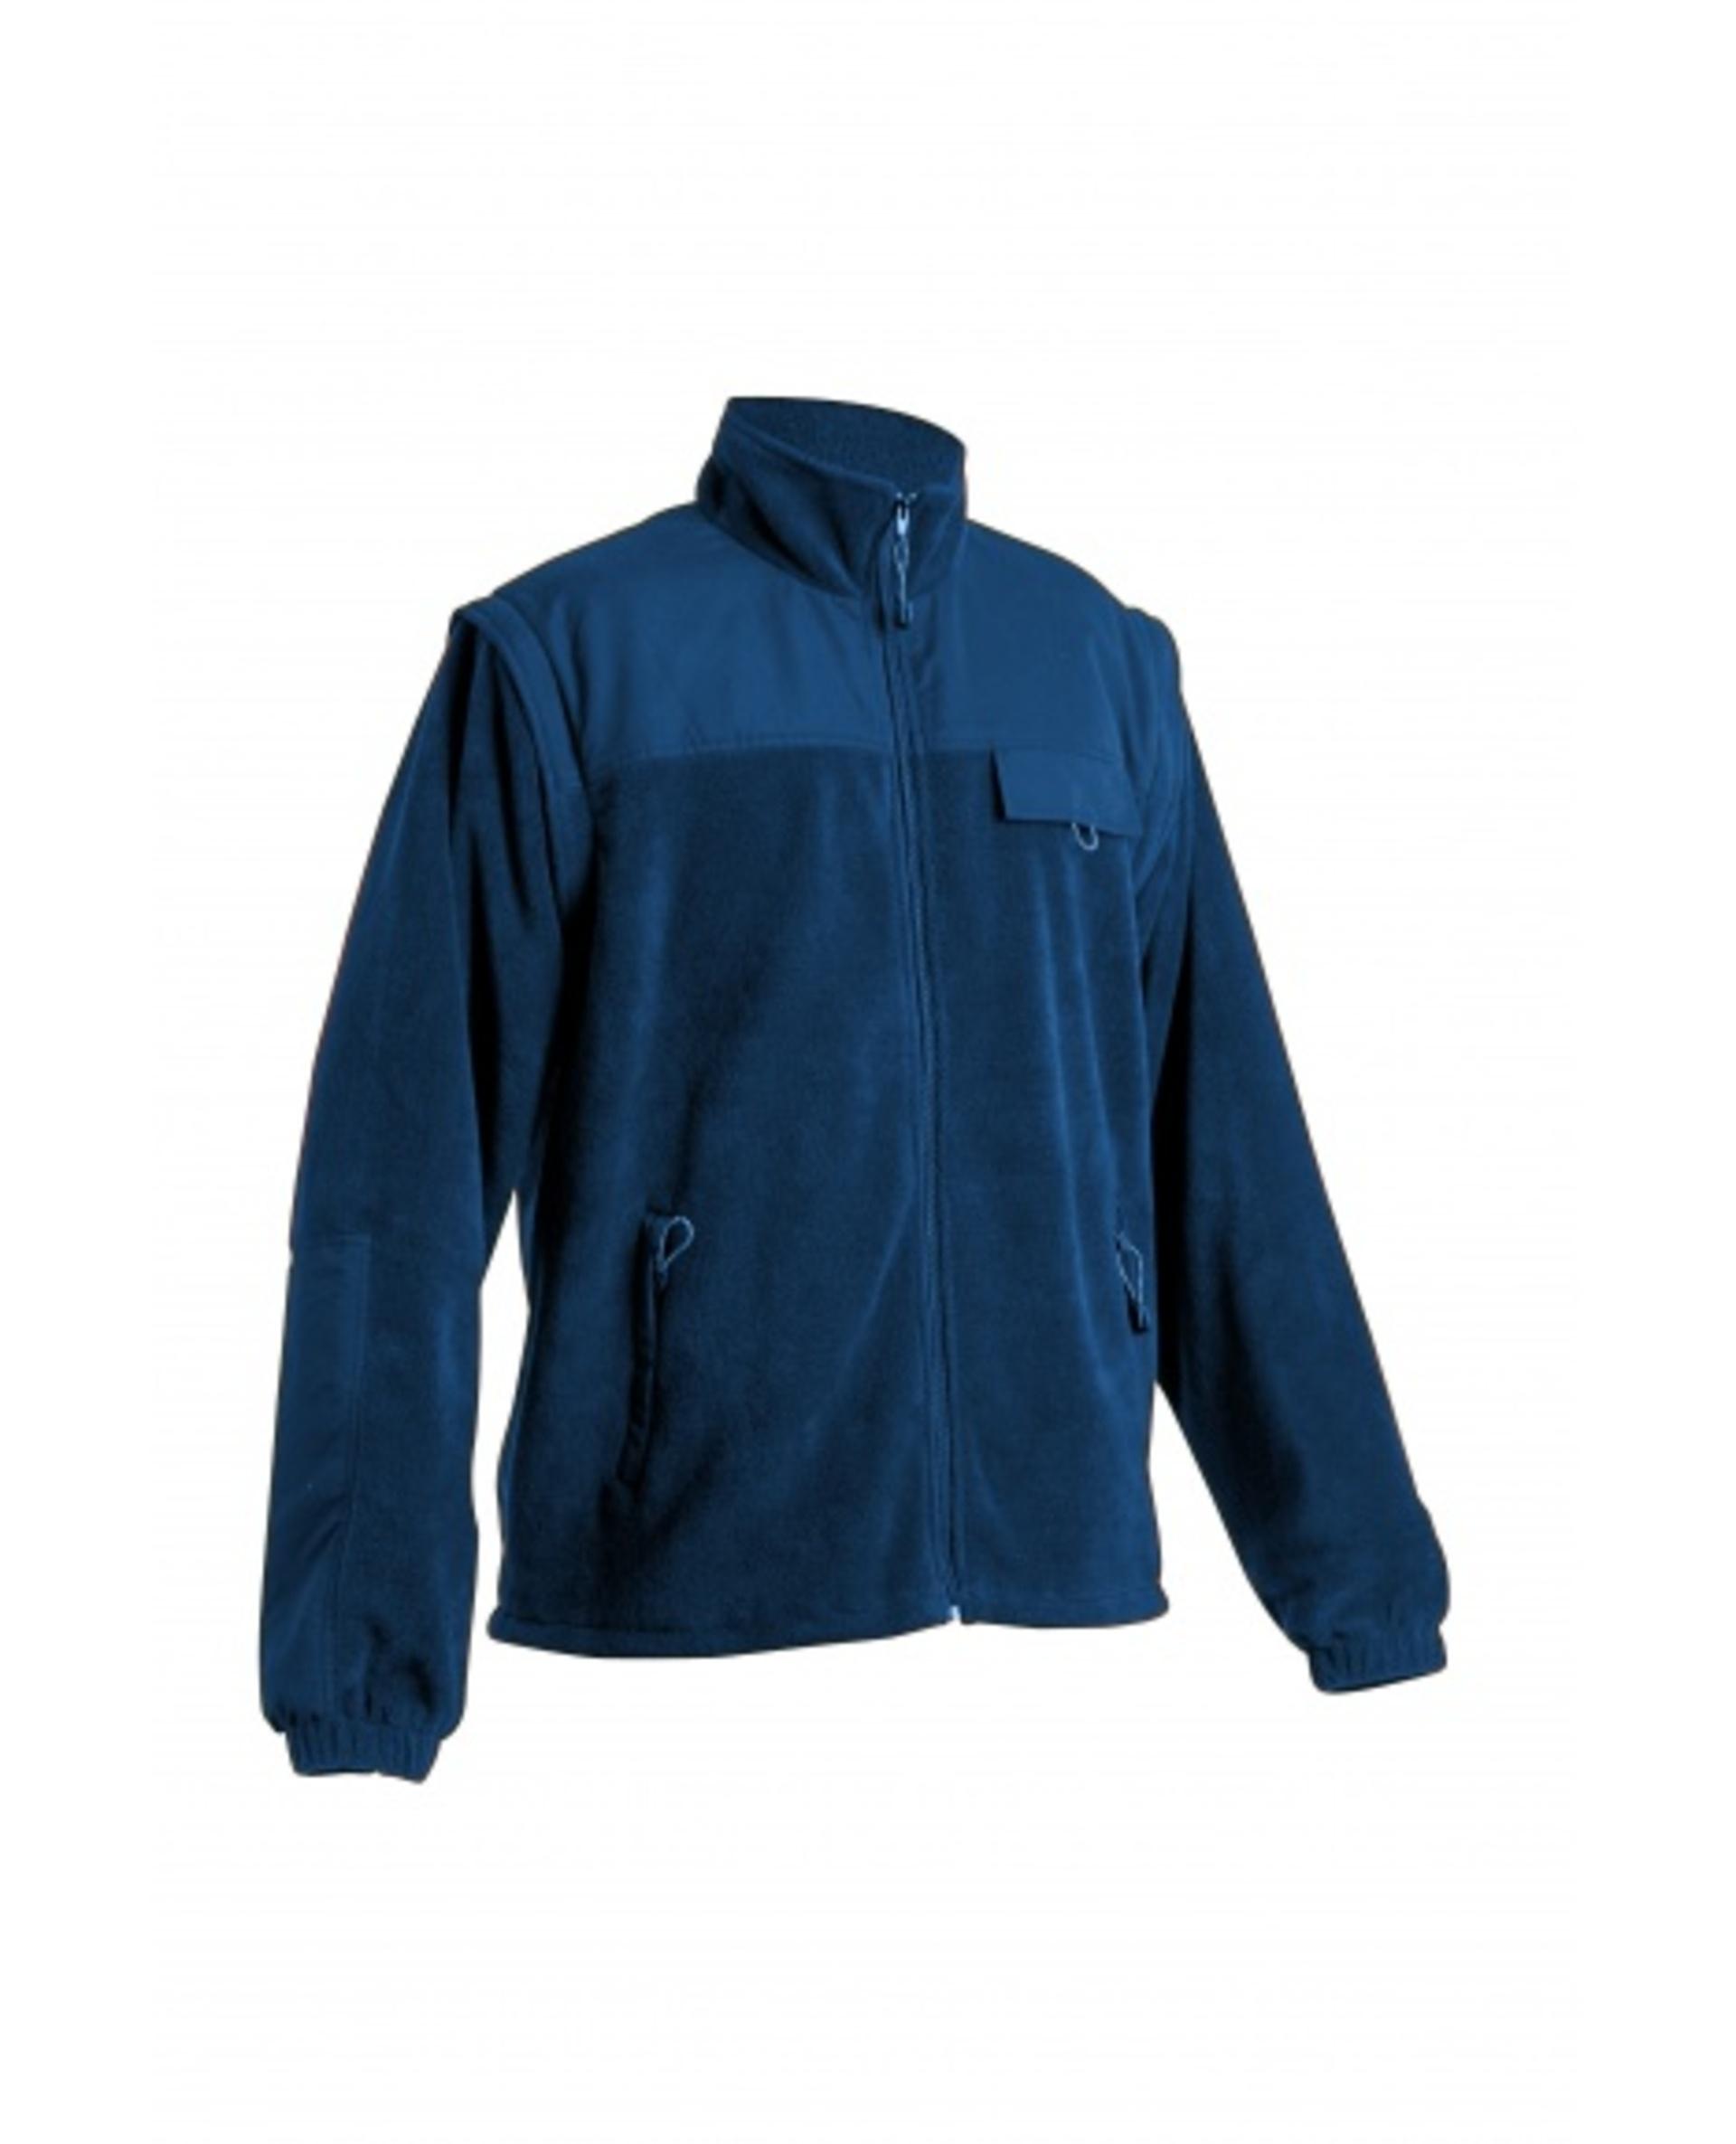 Cerva RANDWIK fleecová 2v1 Bunda tmavě modrá S